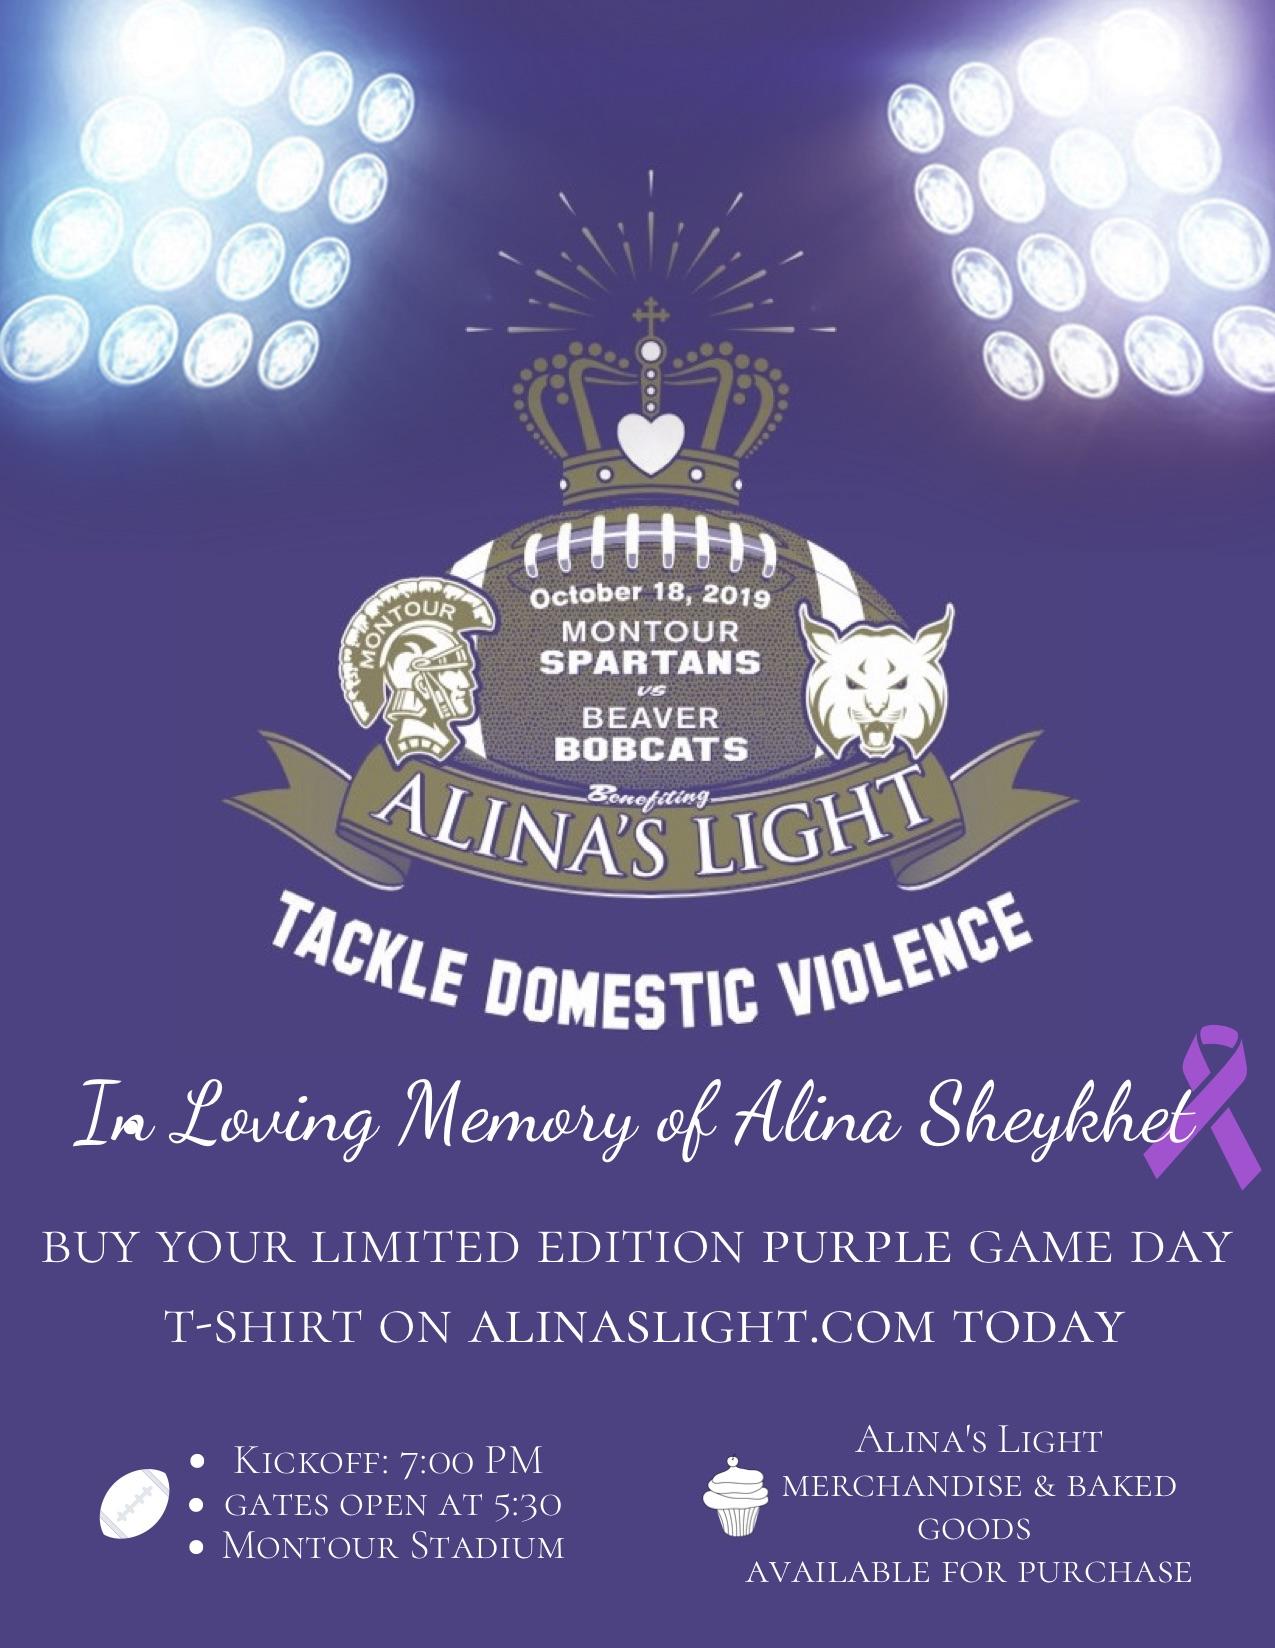 Tackle Domestic Violence 2019 Flyer